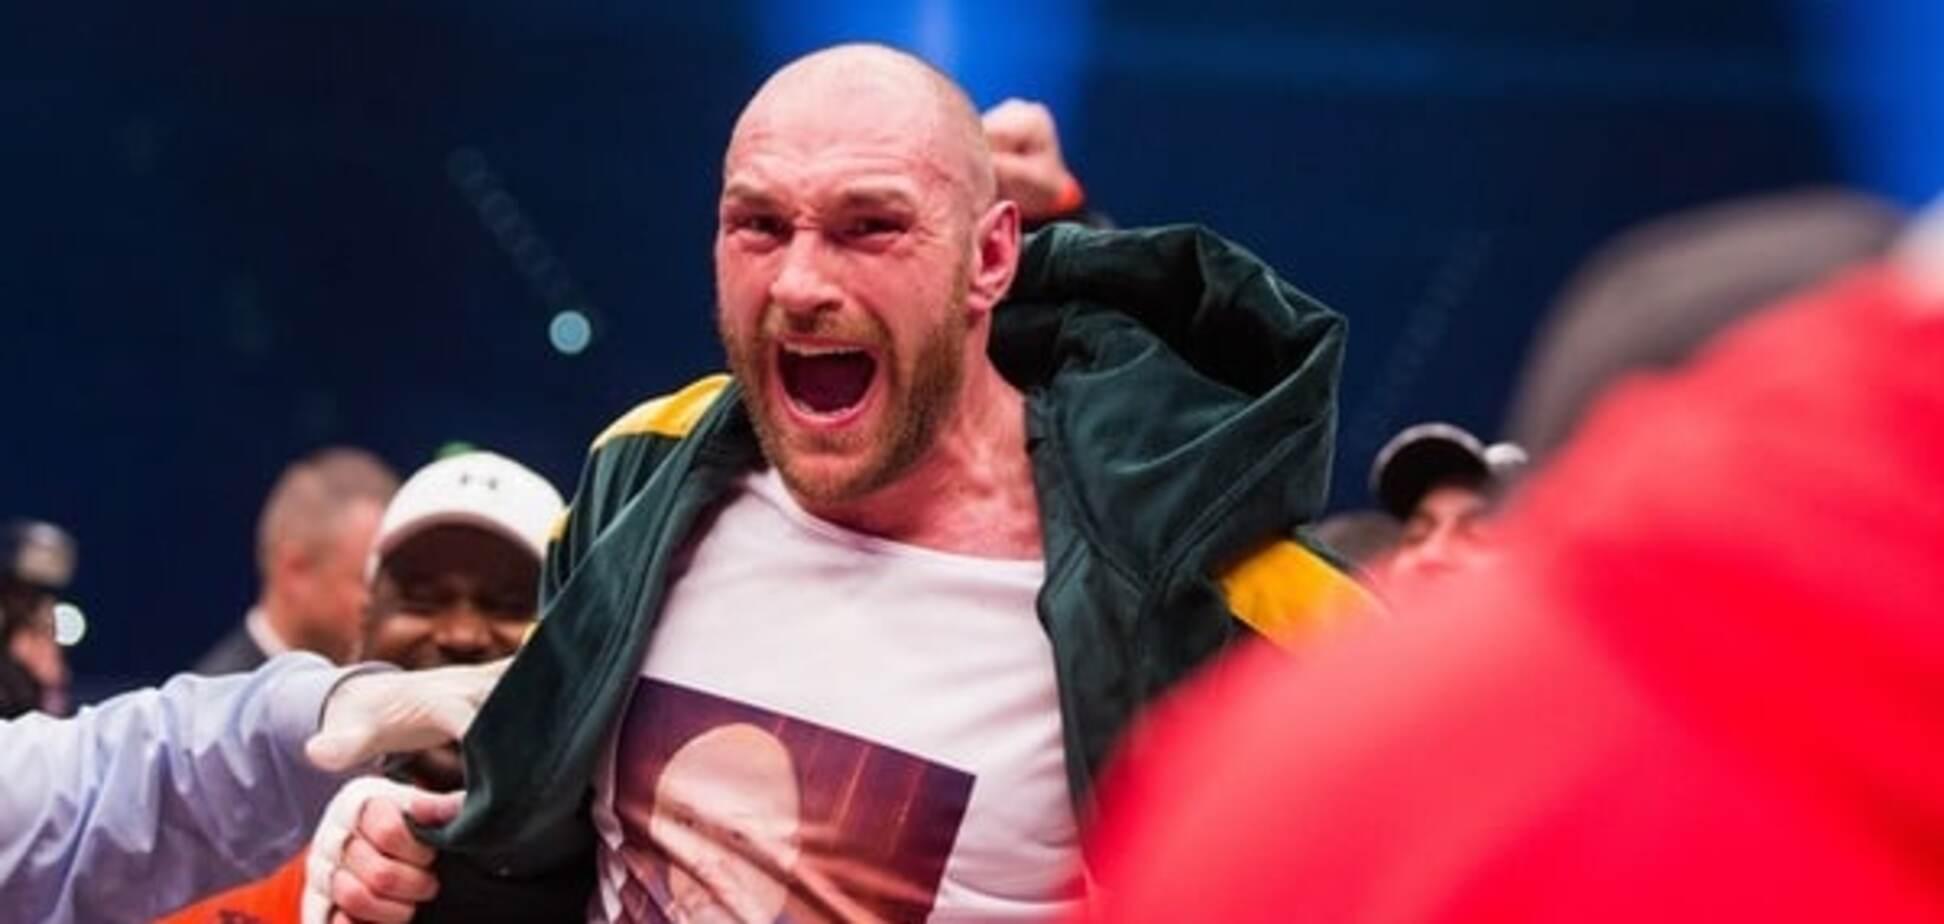 'Безнадійний': Тайсон загнобив непереможного українського боксера